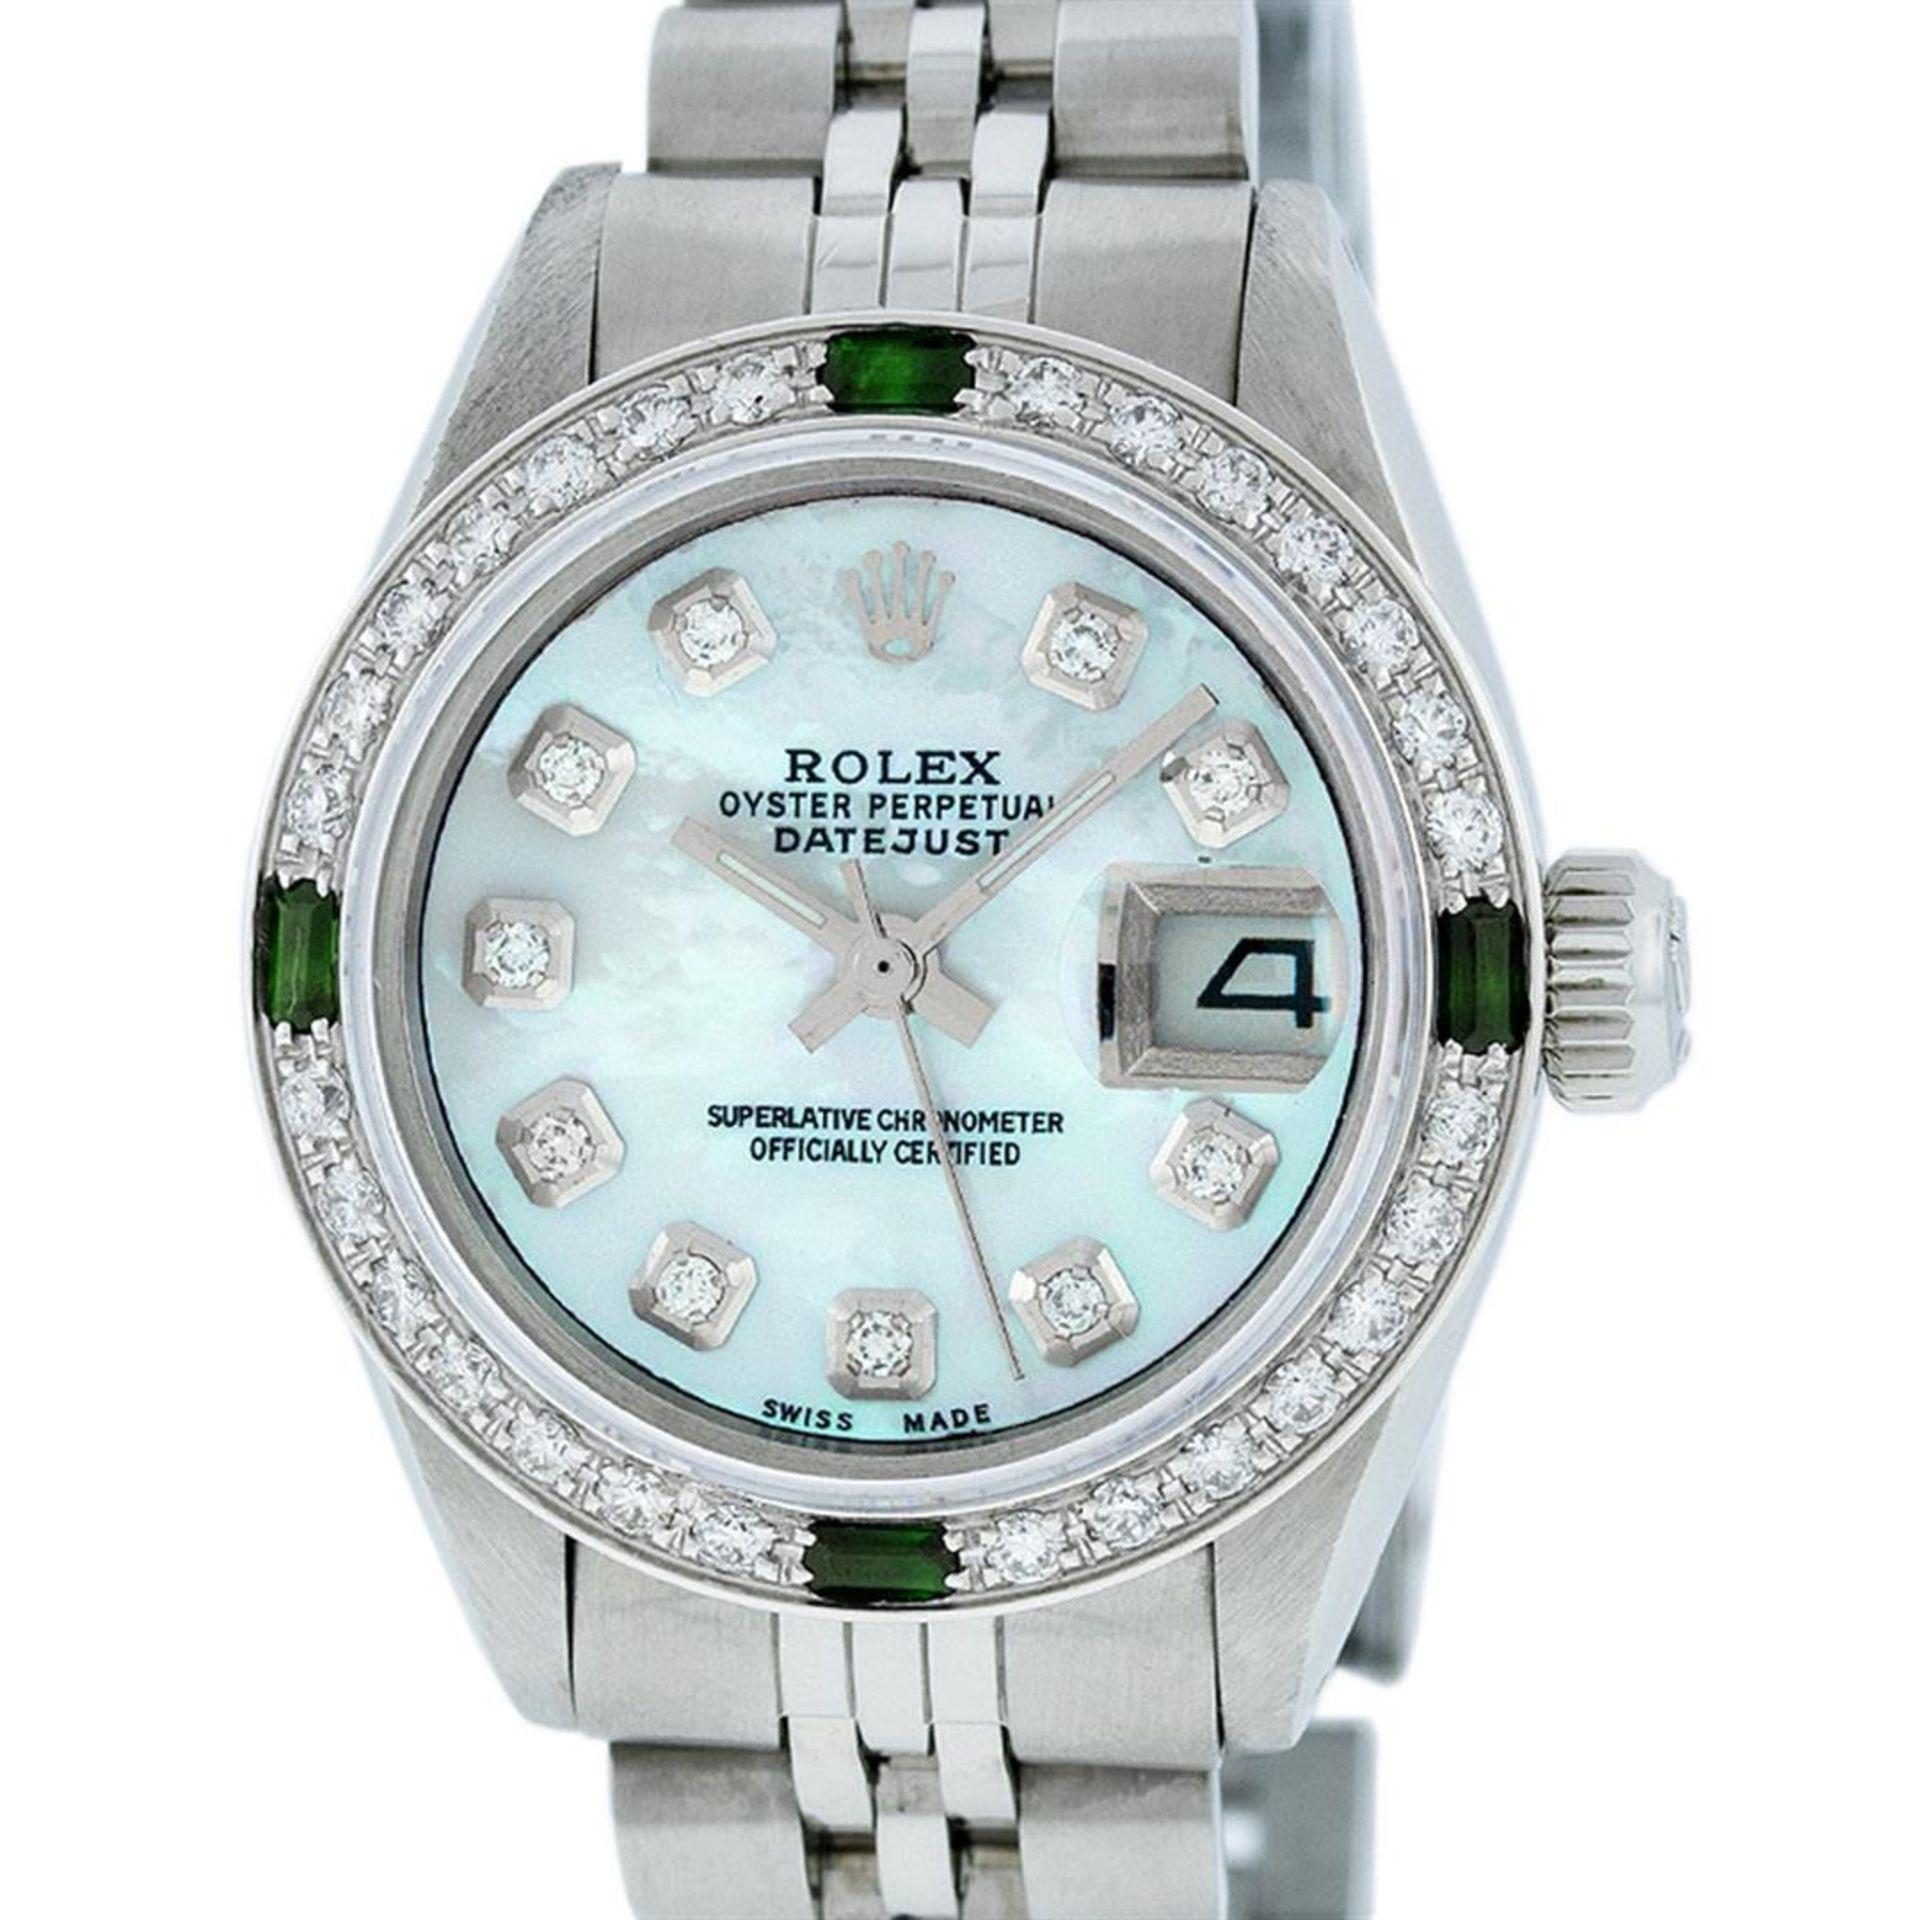 Rolex Ladies Stainless Steel Blue MOP Diamond & Emerald Datejust Wristwatch - Image 2 of 9